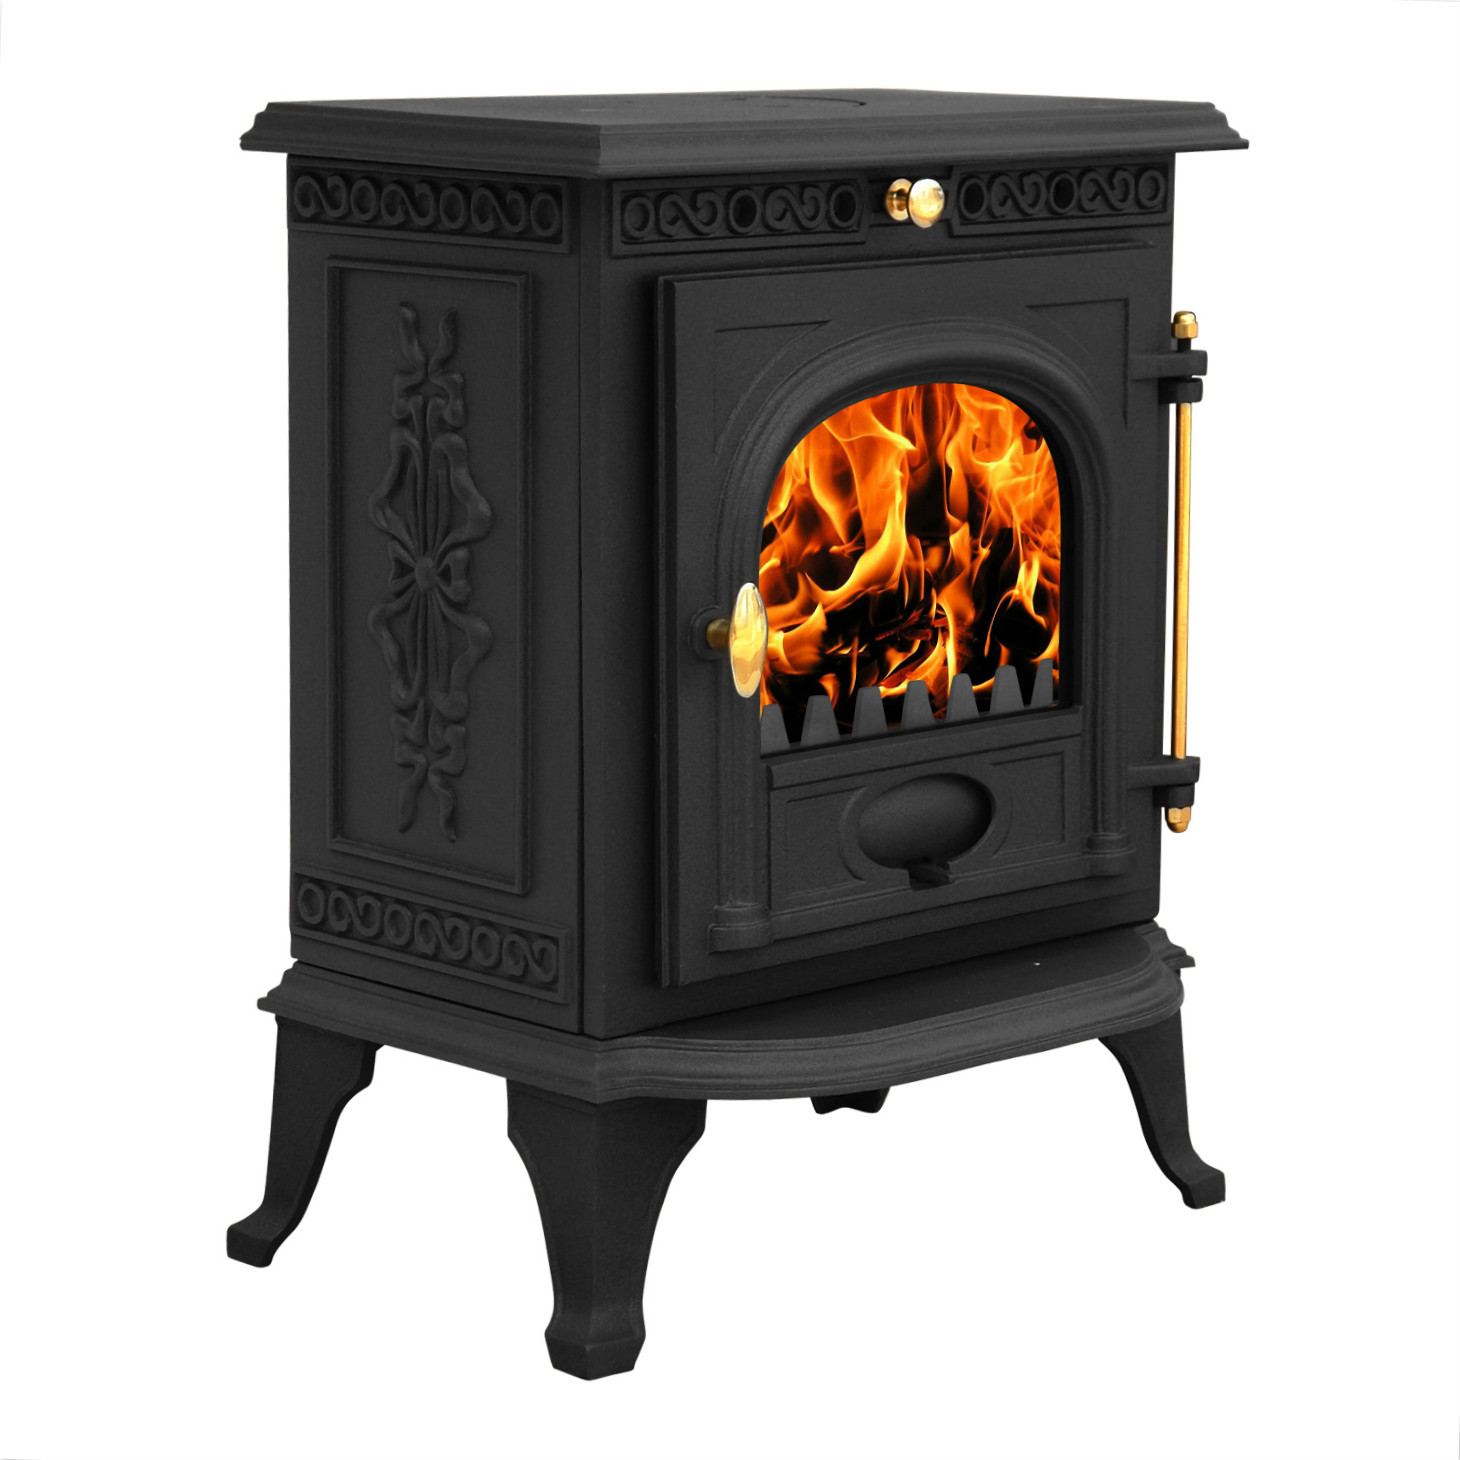 Ja014 6 5kw cast iron log burner modern multifuel wood for Wood burning stove for screened porch